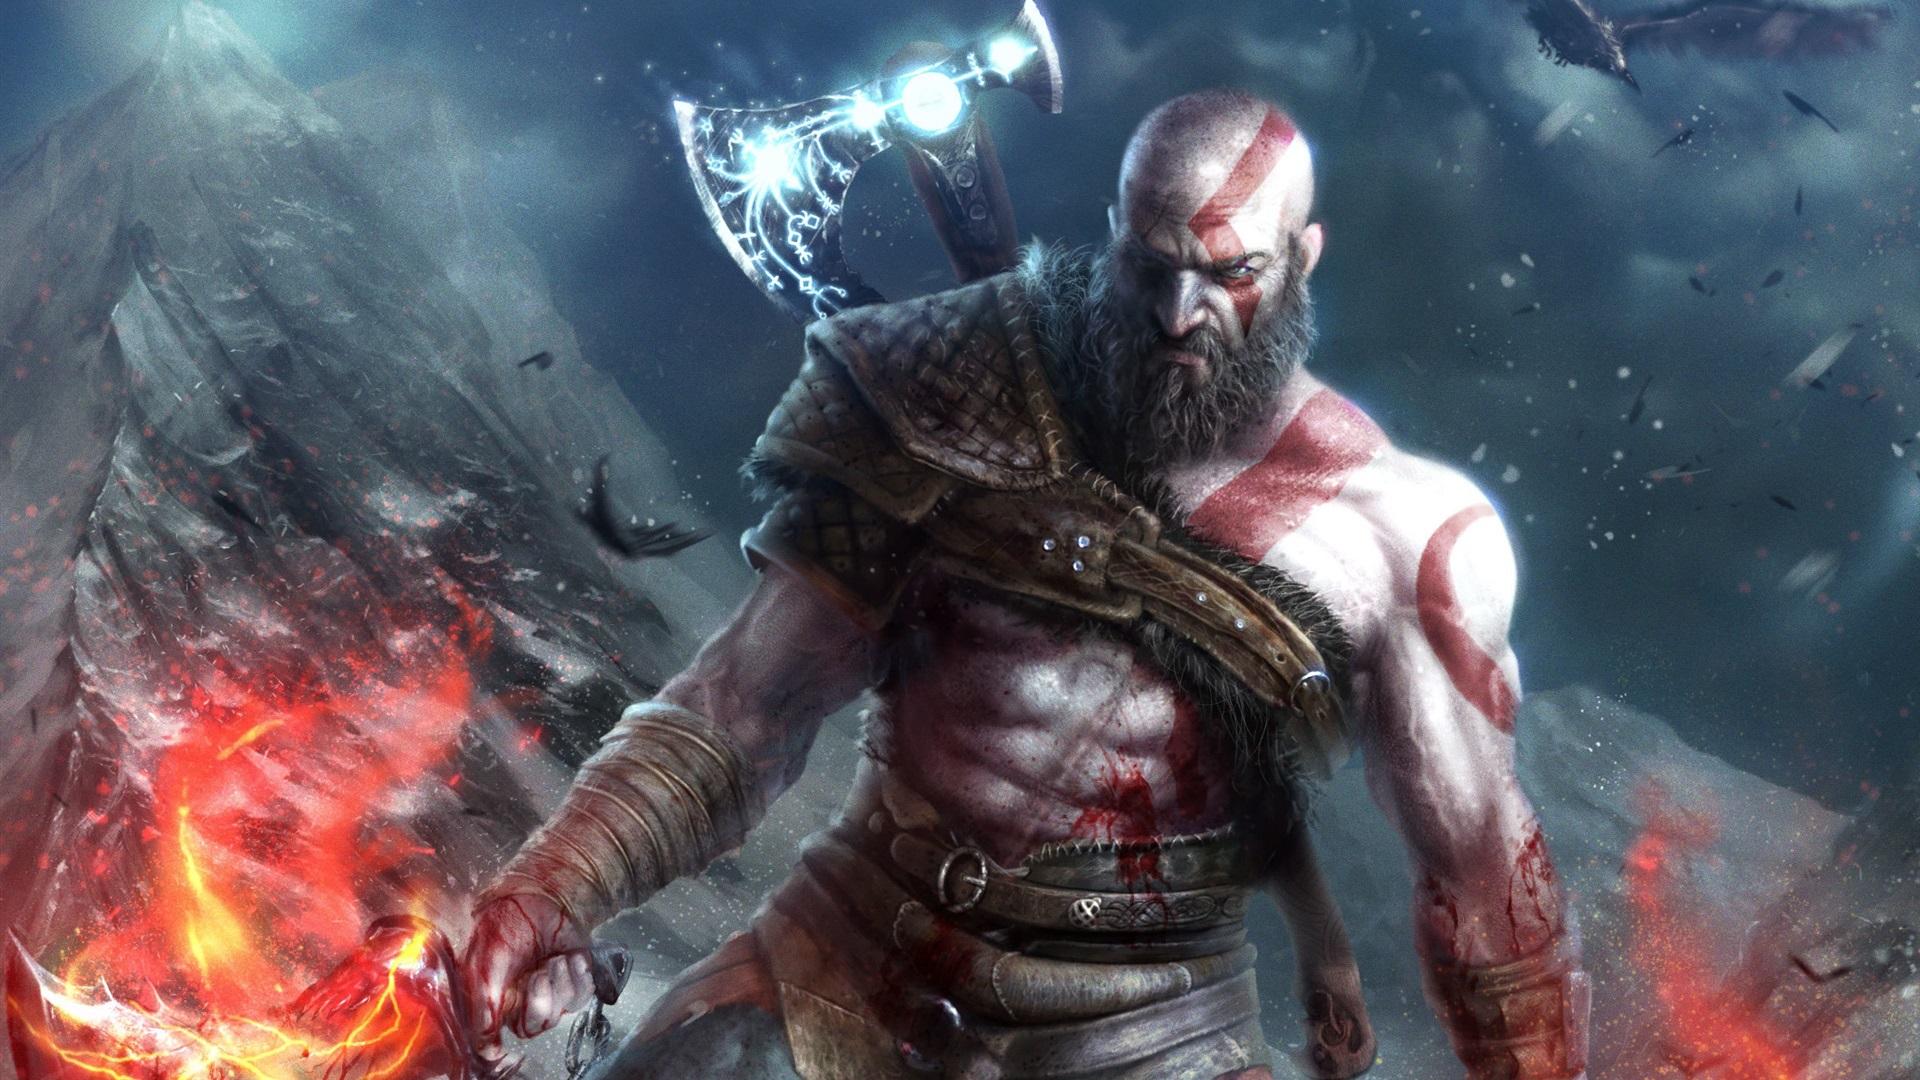 Fondos De Pantalla God Of War 4 Videojuegos 2560x1600 Hd Imagen